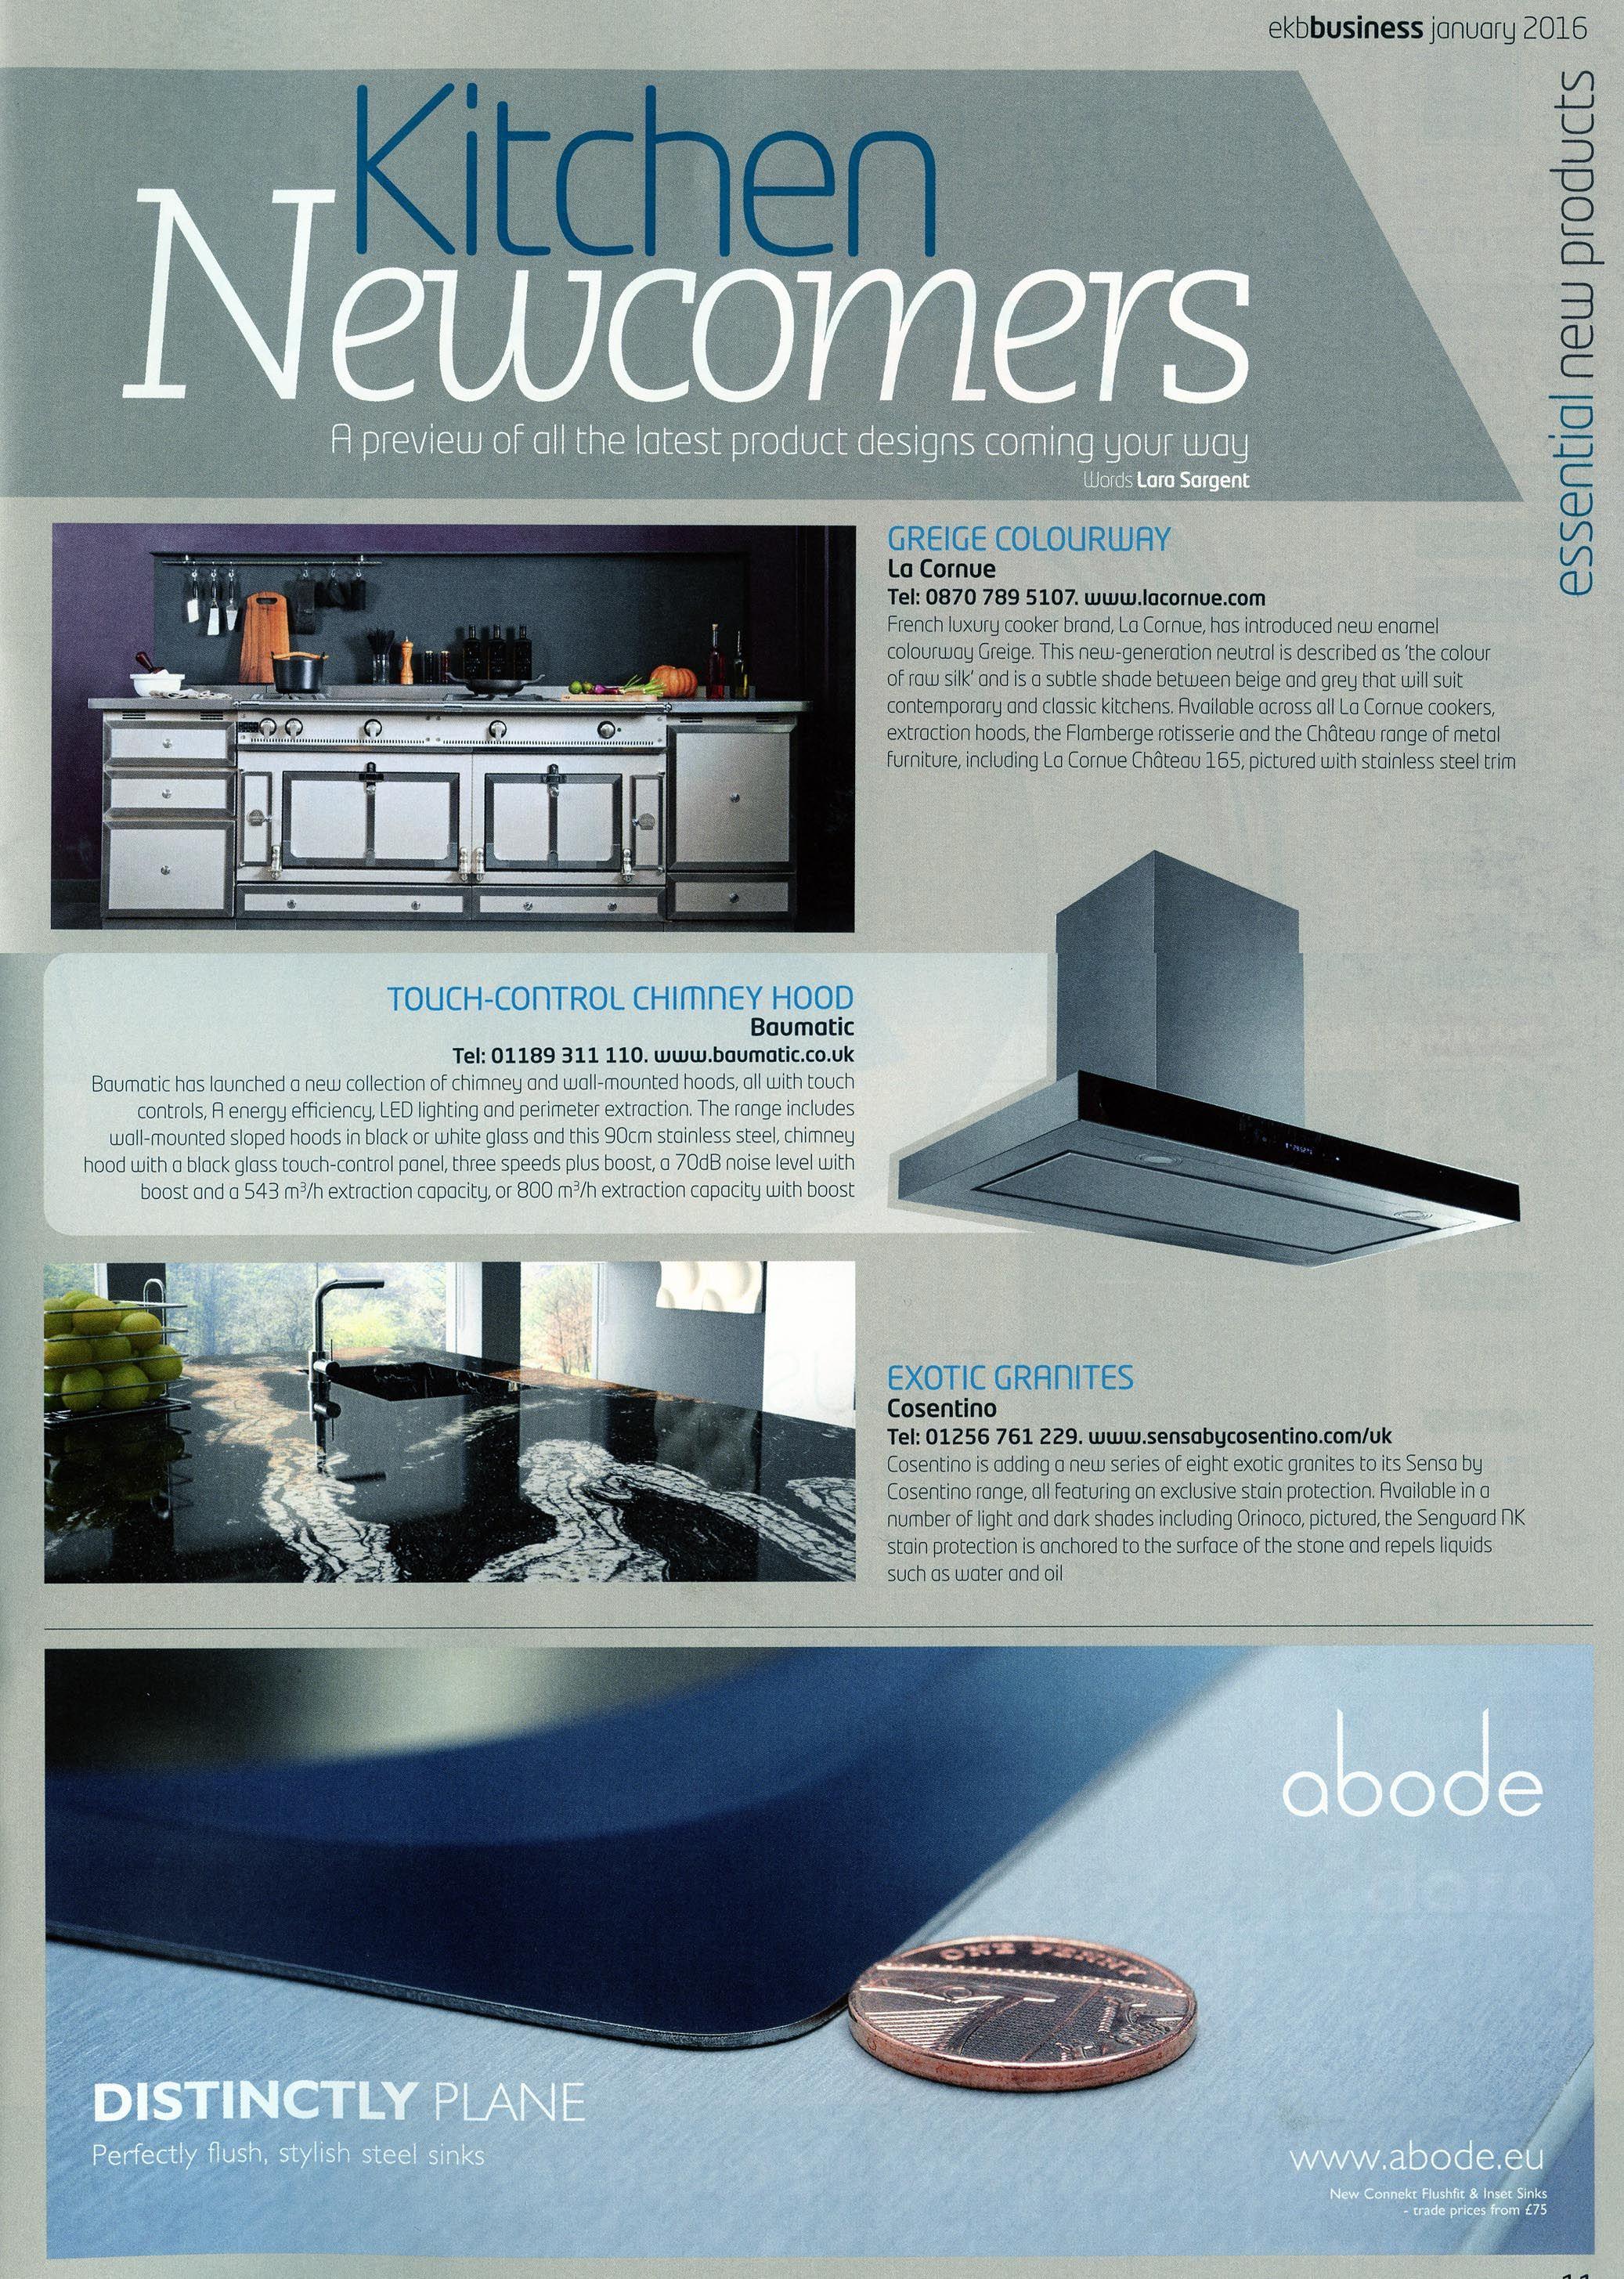 The new luxurious enamel colourway Greige cooker from La Cornue http ...